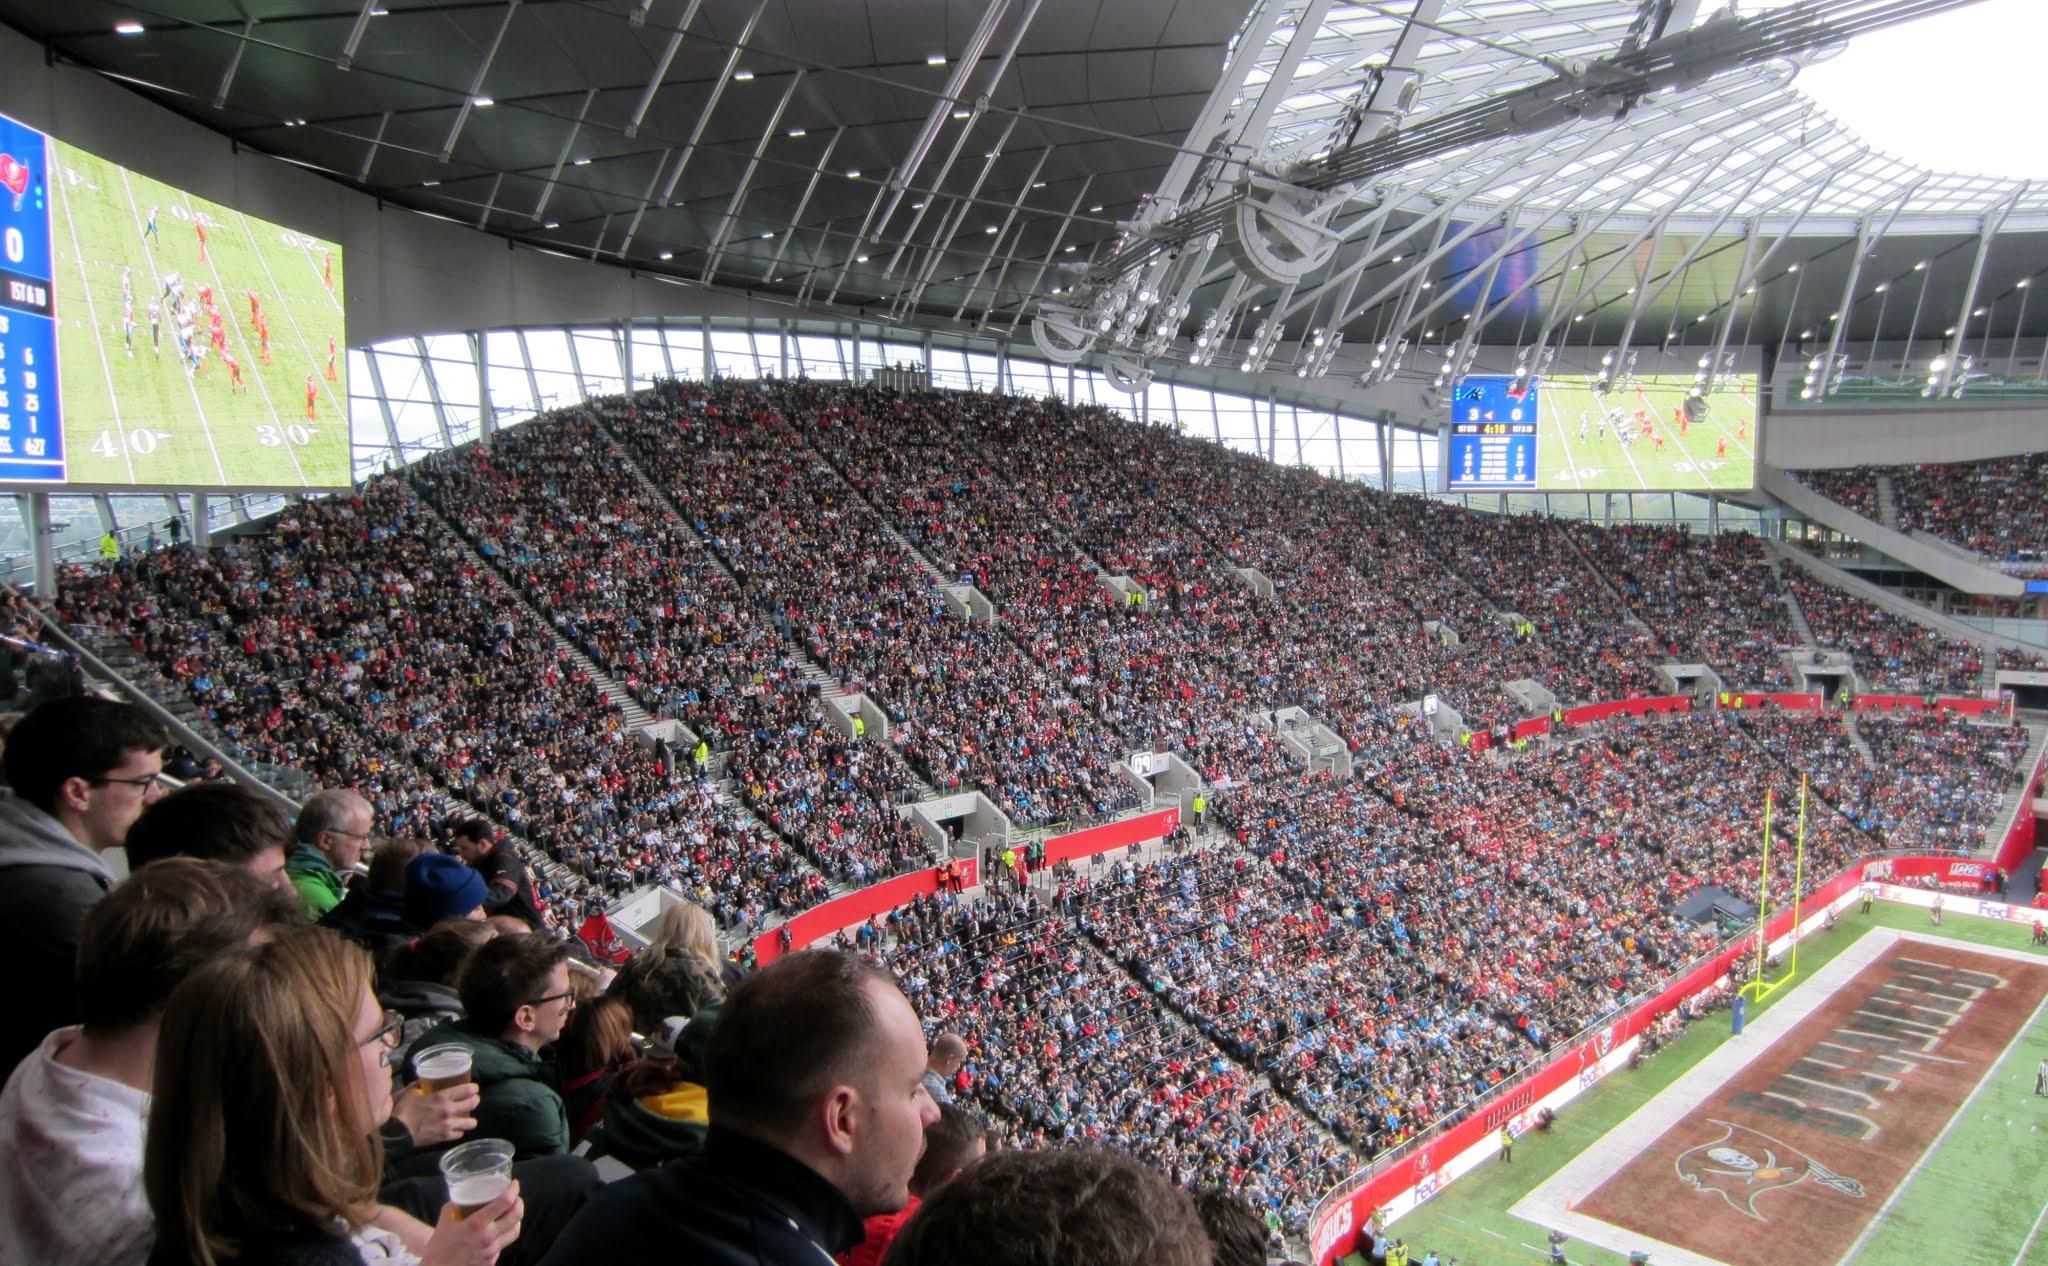 The South Stand at Tottenham Hotspur Stadium